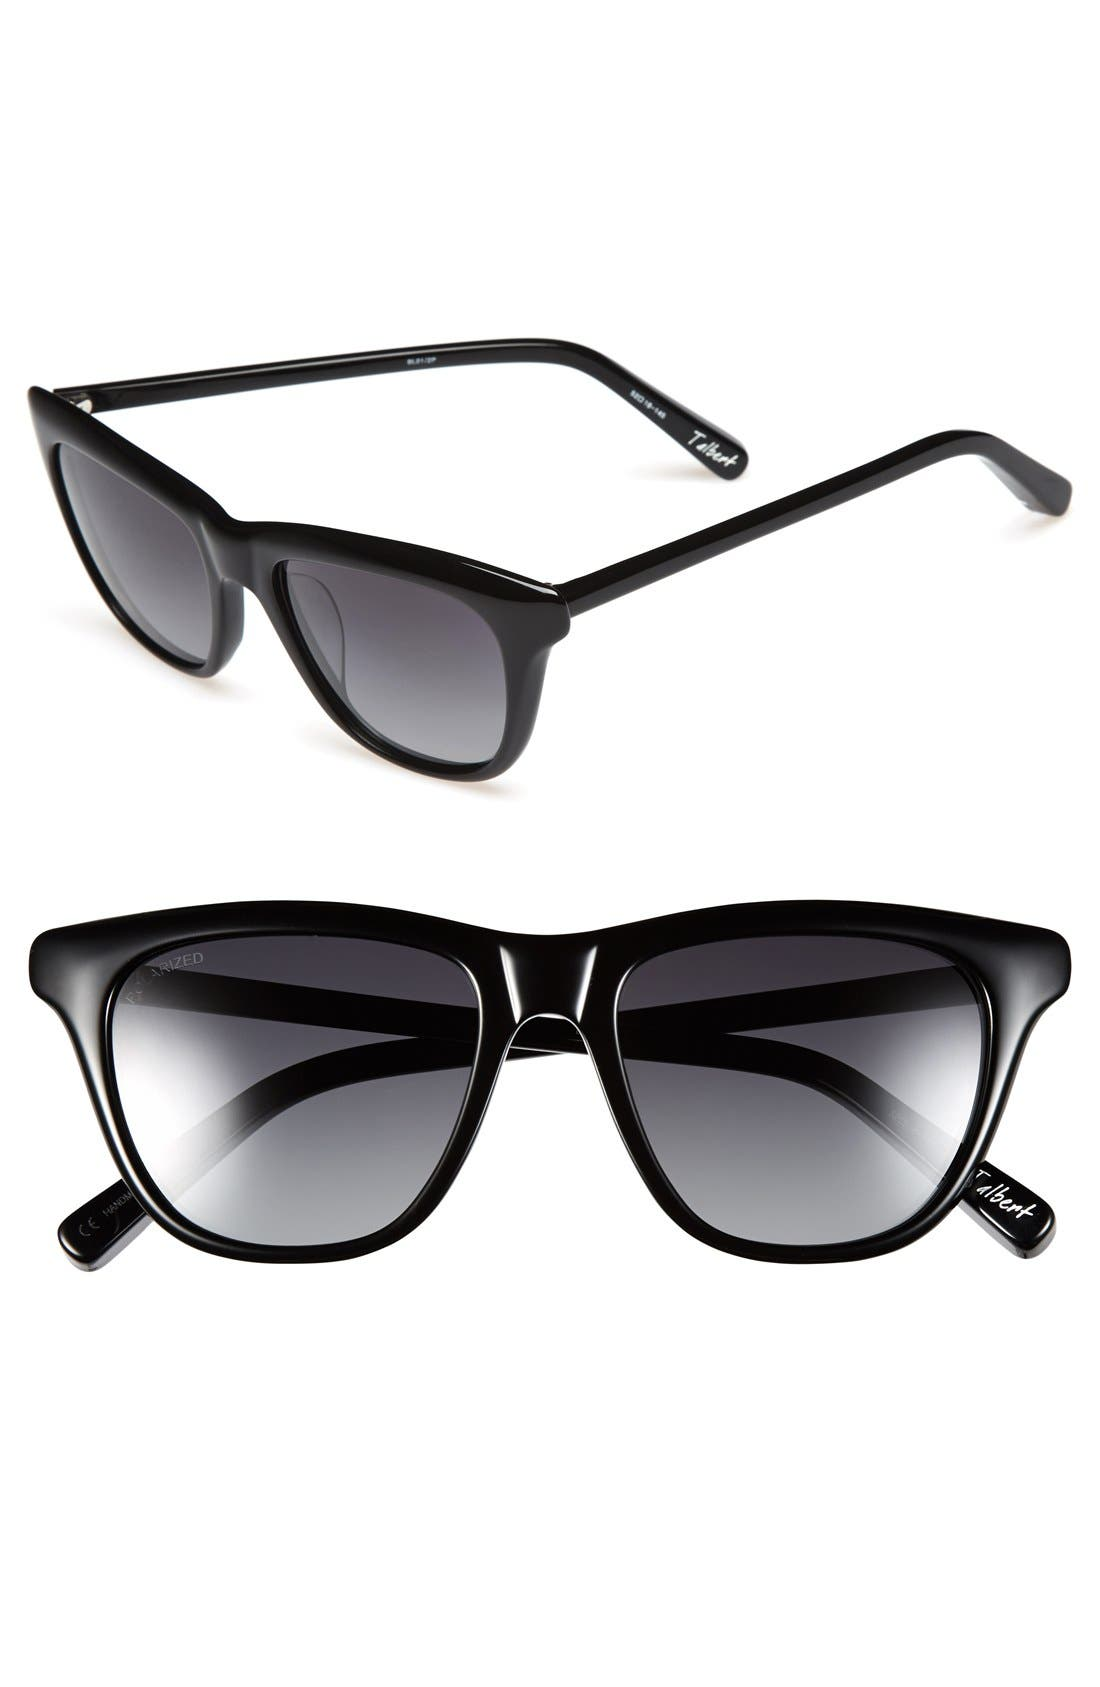 Alternate Image 1 Selected - Elizabeth and James 'Talbert' 52mm Polarized Sunglasses